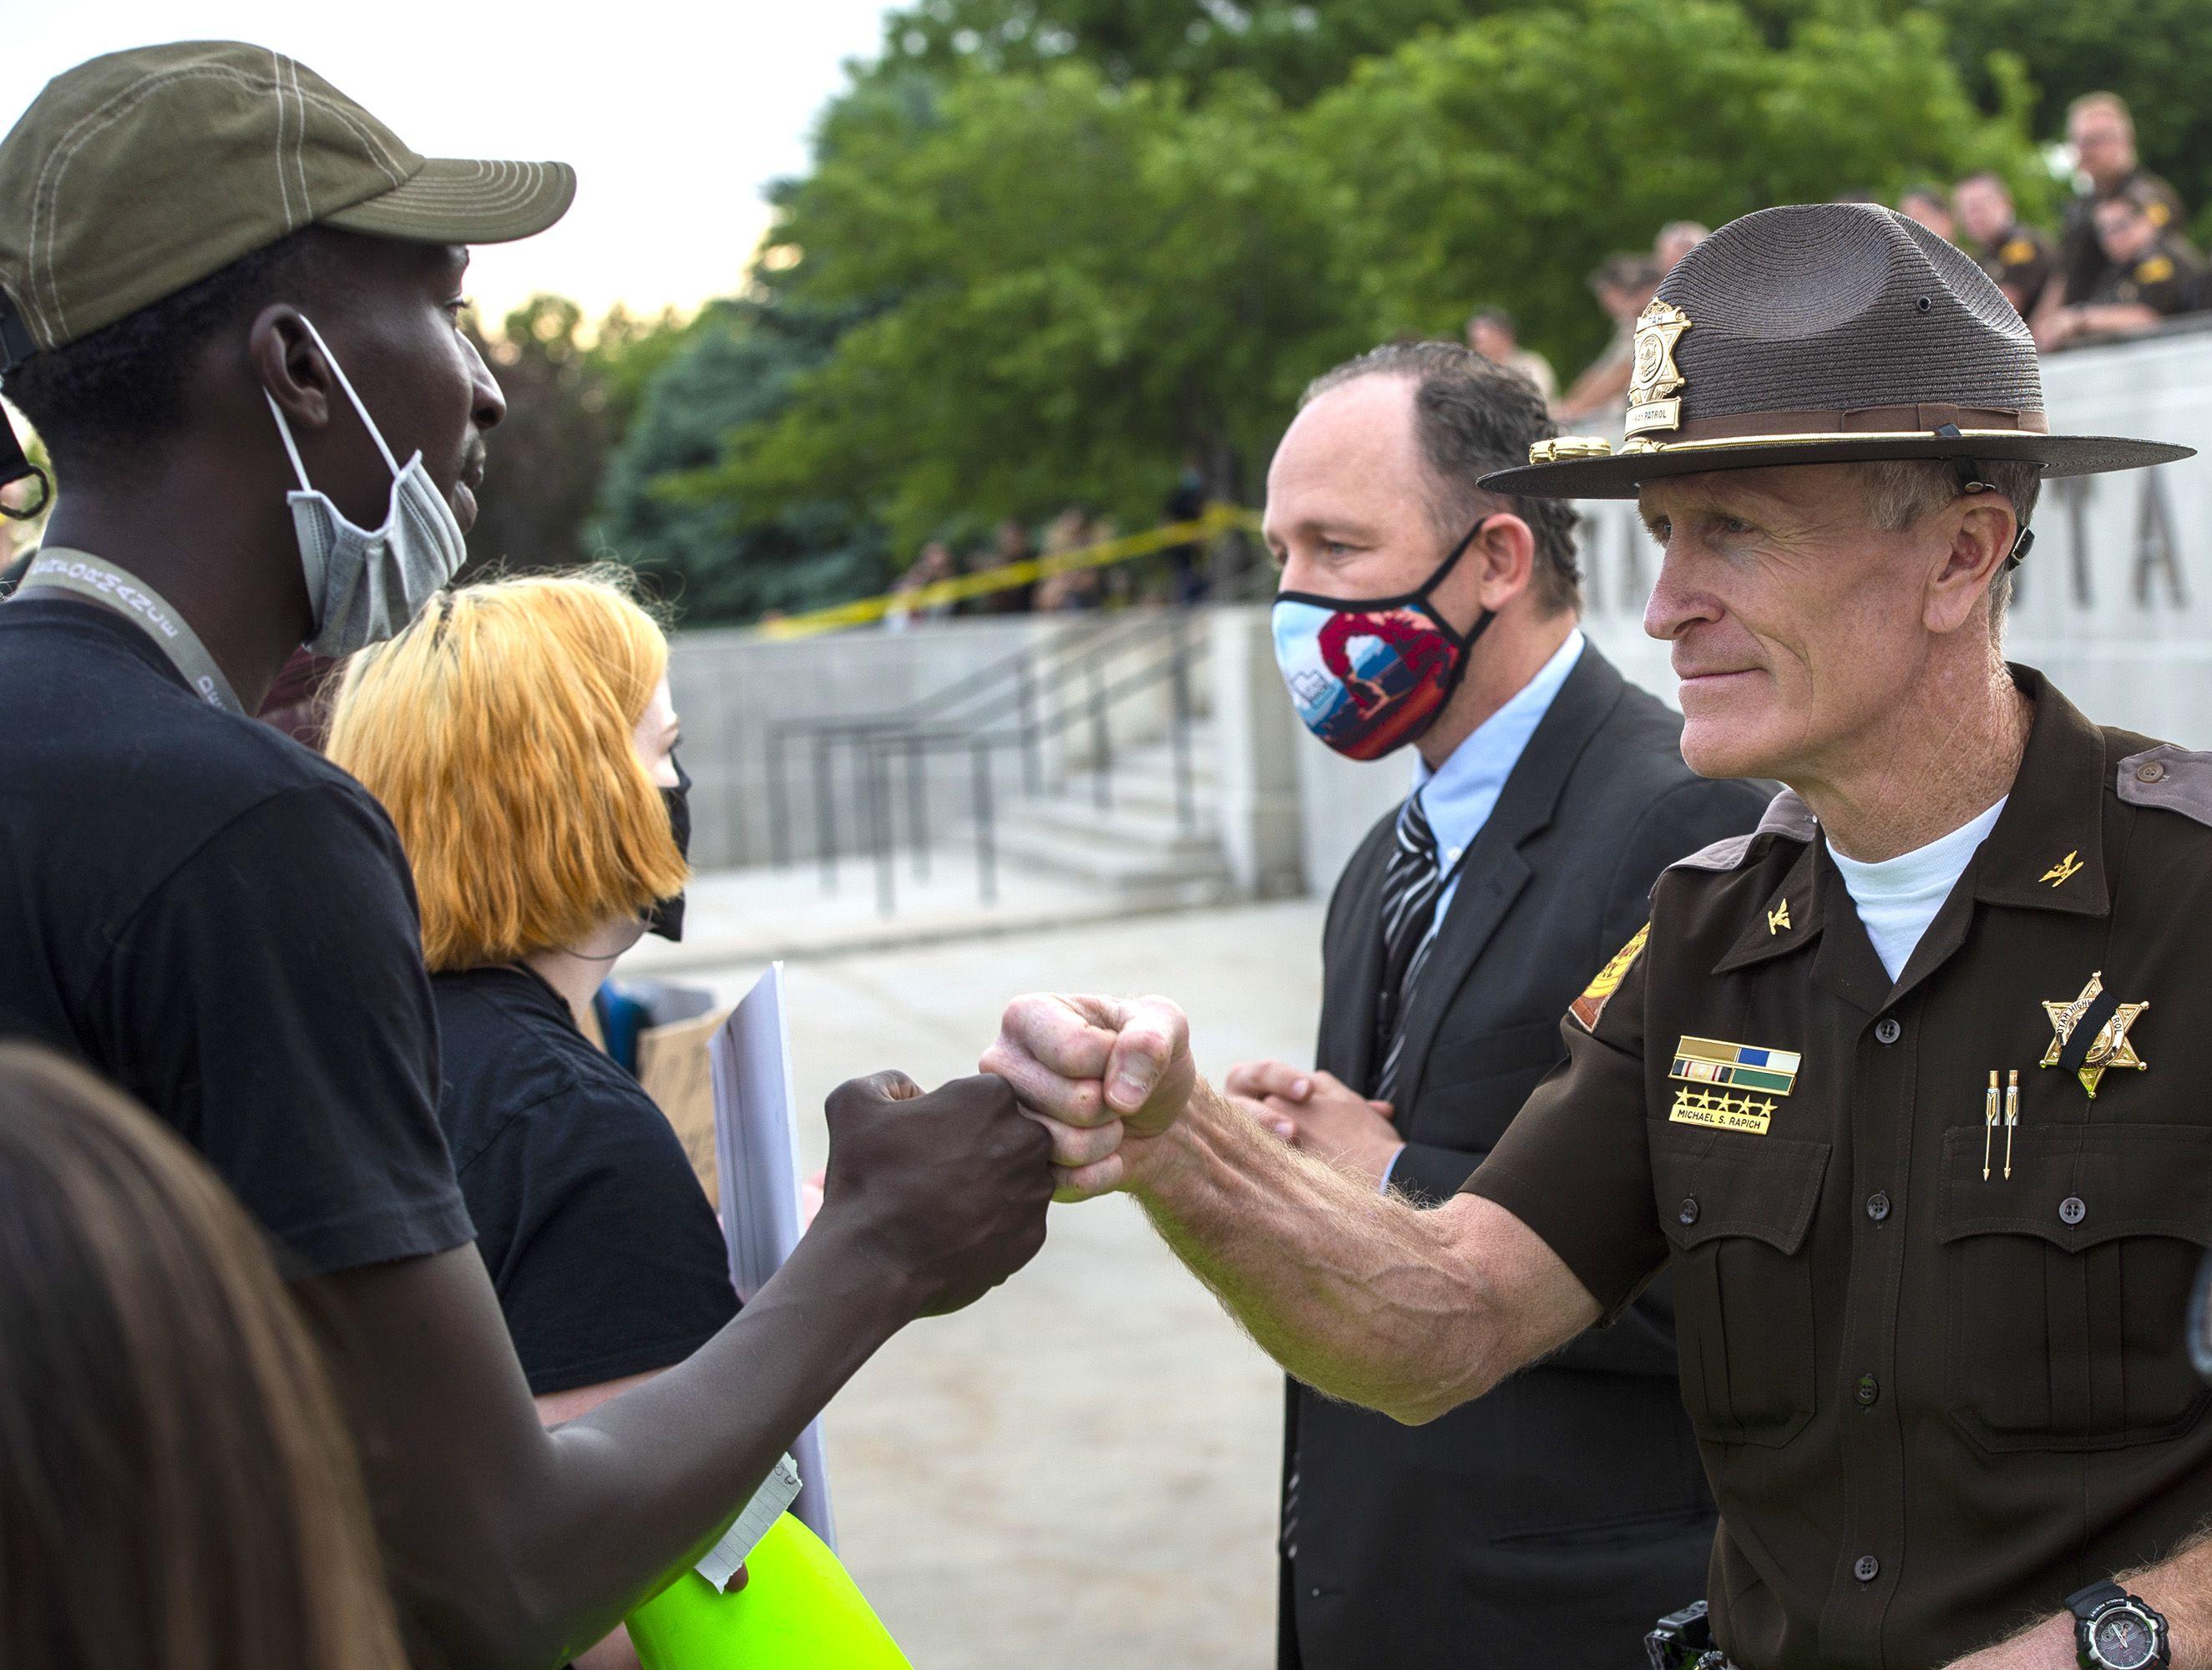 (Rick Egan  |  The Salt Lake Tribune) BK Guajain fist bumps Utah Highway Patrol Major, Michael Rapich in front of the  the State Capitol, during a George Floyd demonstration in Salt Lake City on Thursday, June 4, 2020.